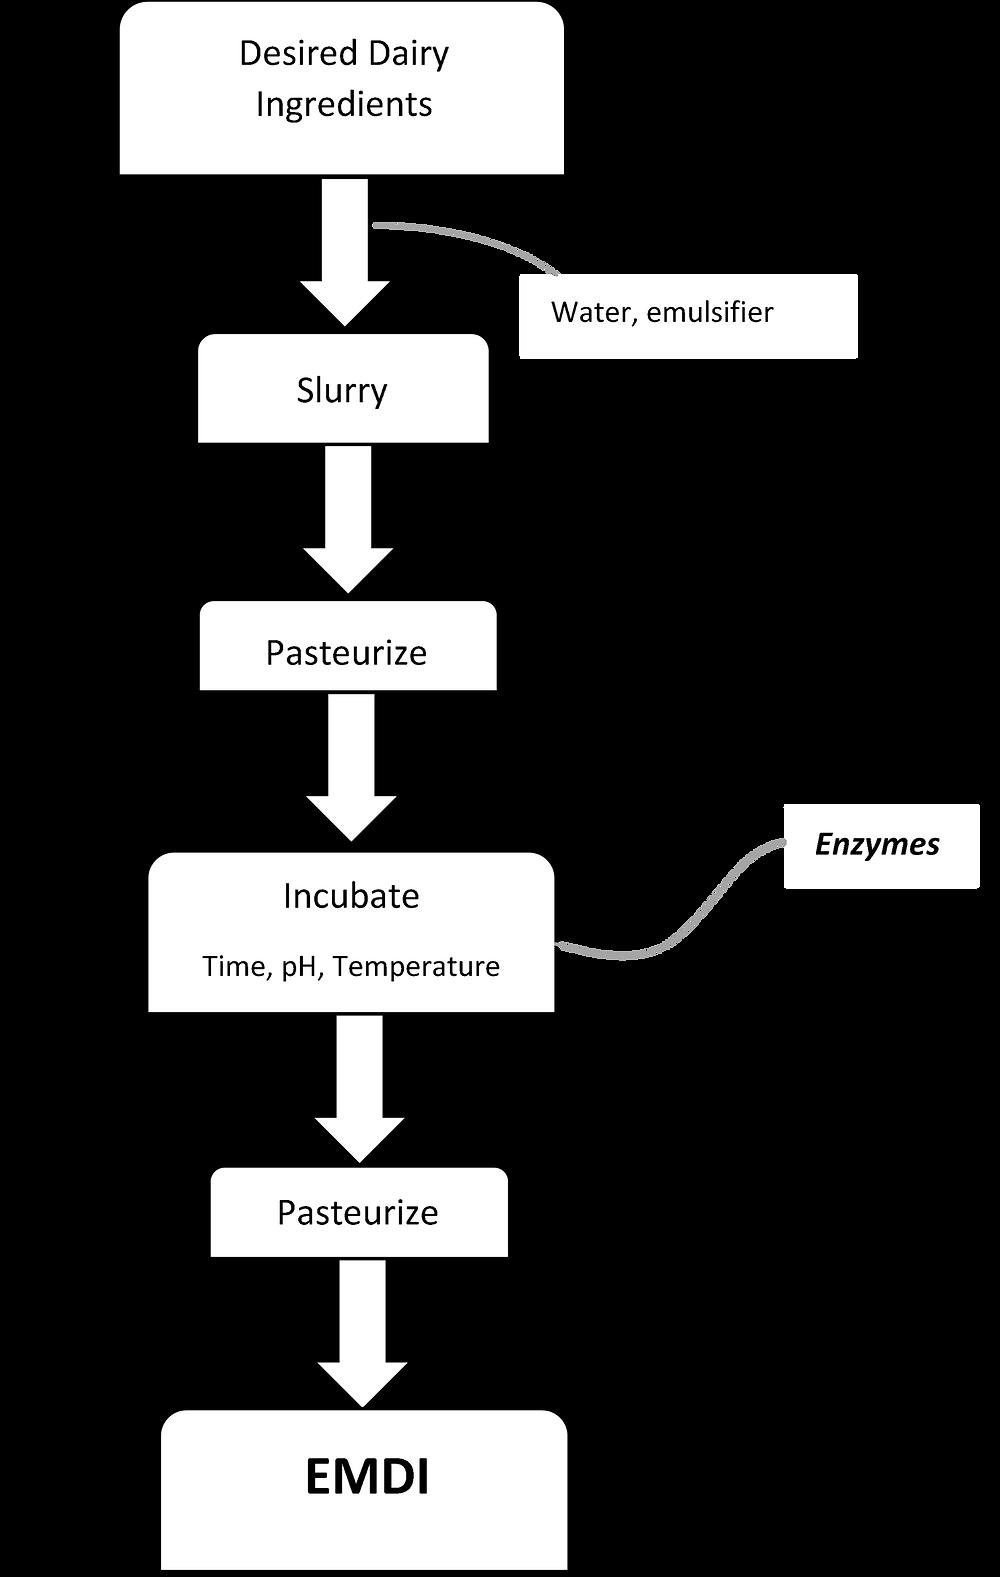 Flow chart of EMDI